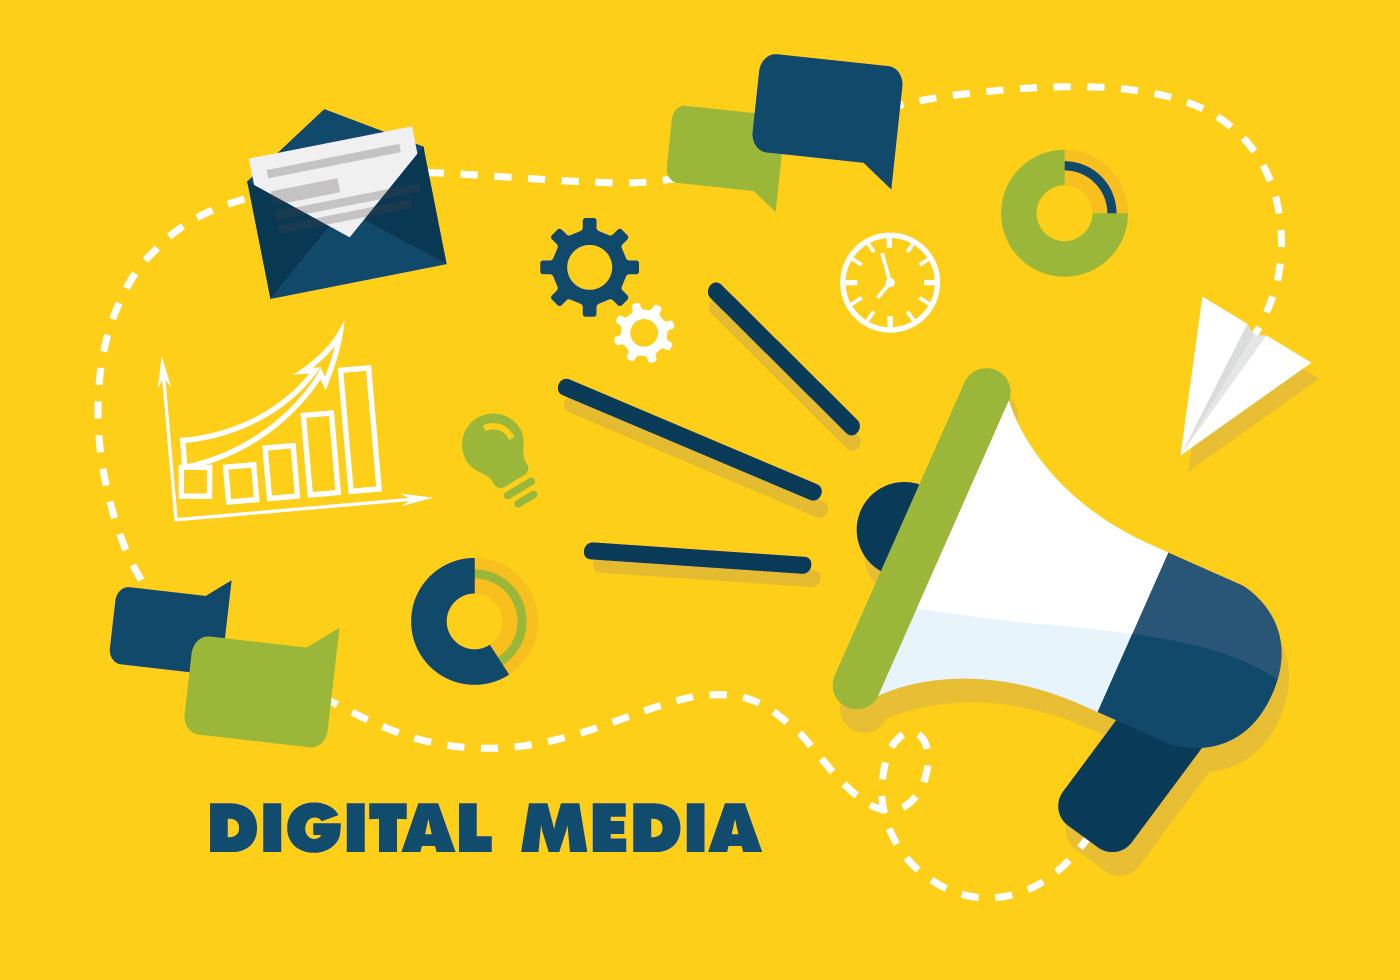 free flat digital marketing vector background download free vectors clipart graphics vector art https www vecteezy com vector art 107468 free flat digital marketing vector background